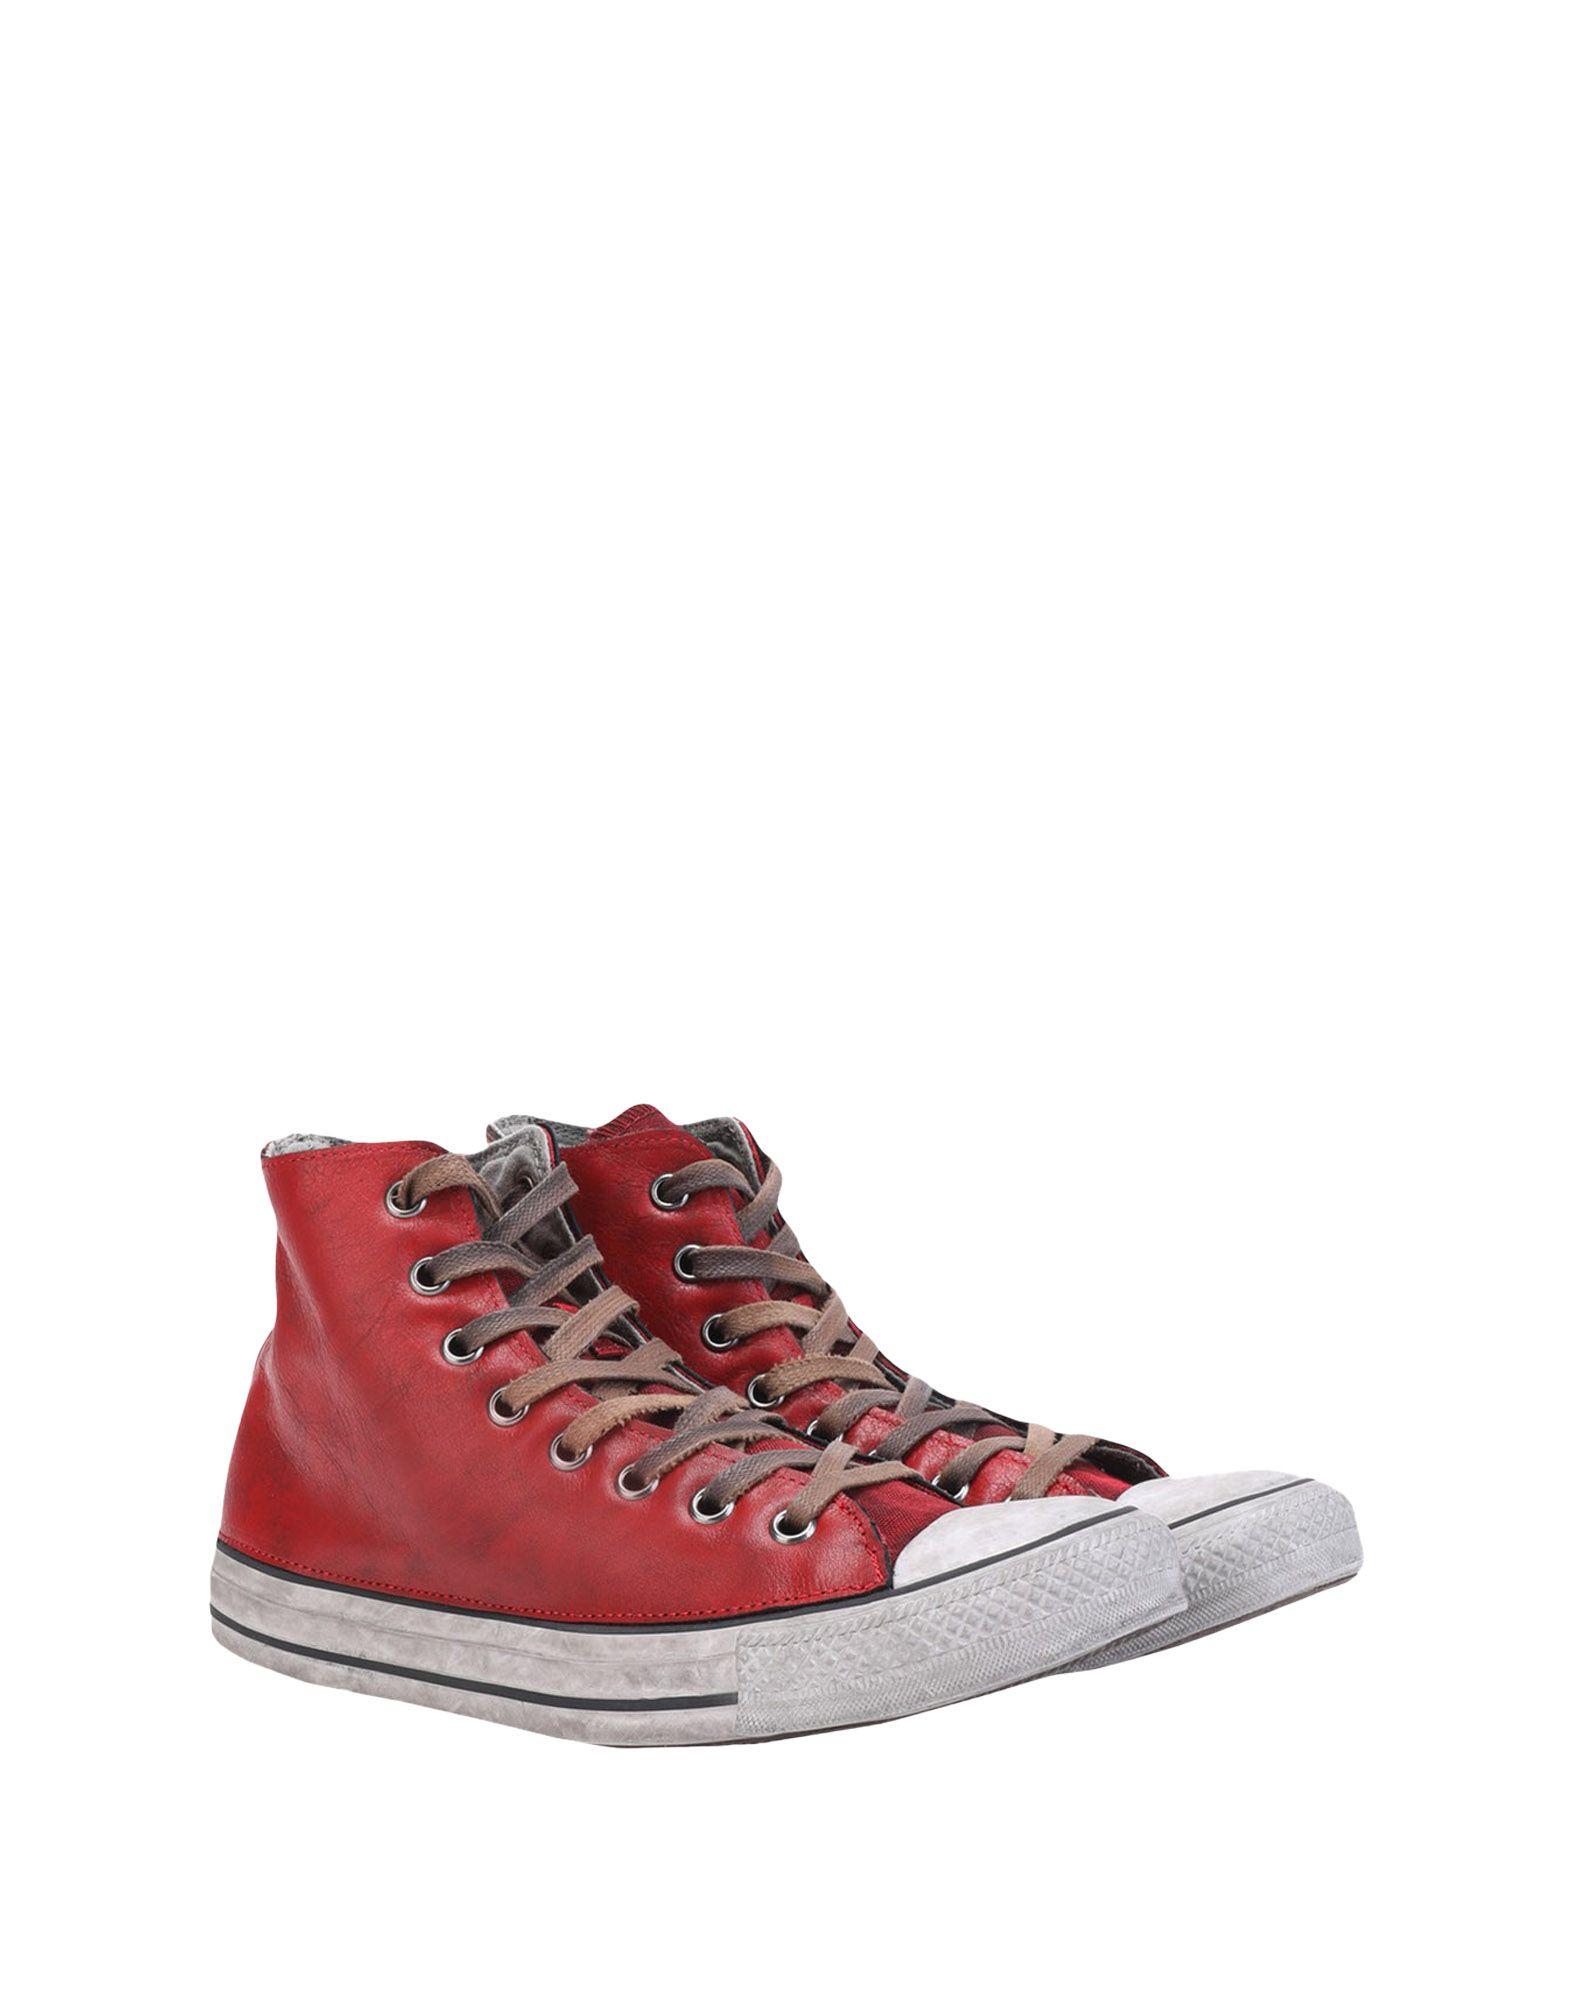 Sneakers Converse Limited Edition Ctas Hi Canvas/Leather Ltd - Homme - Sneakers Converse Limited Edition sur